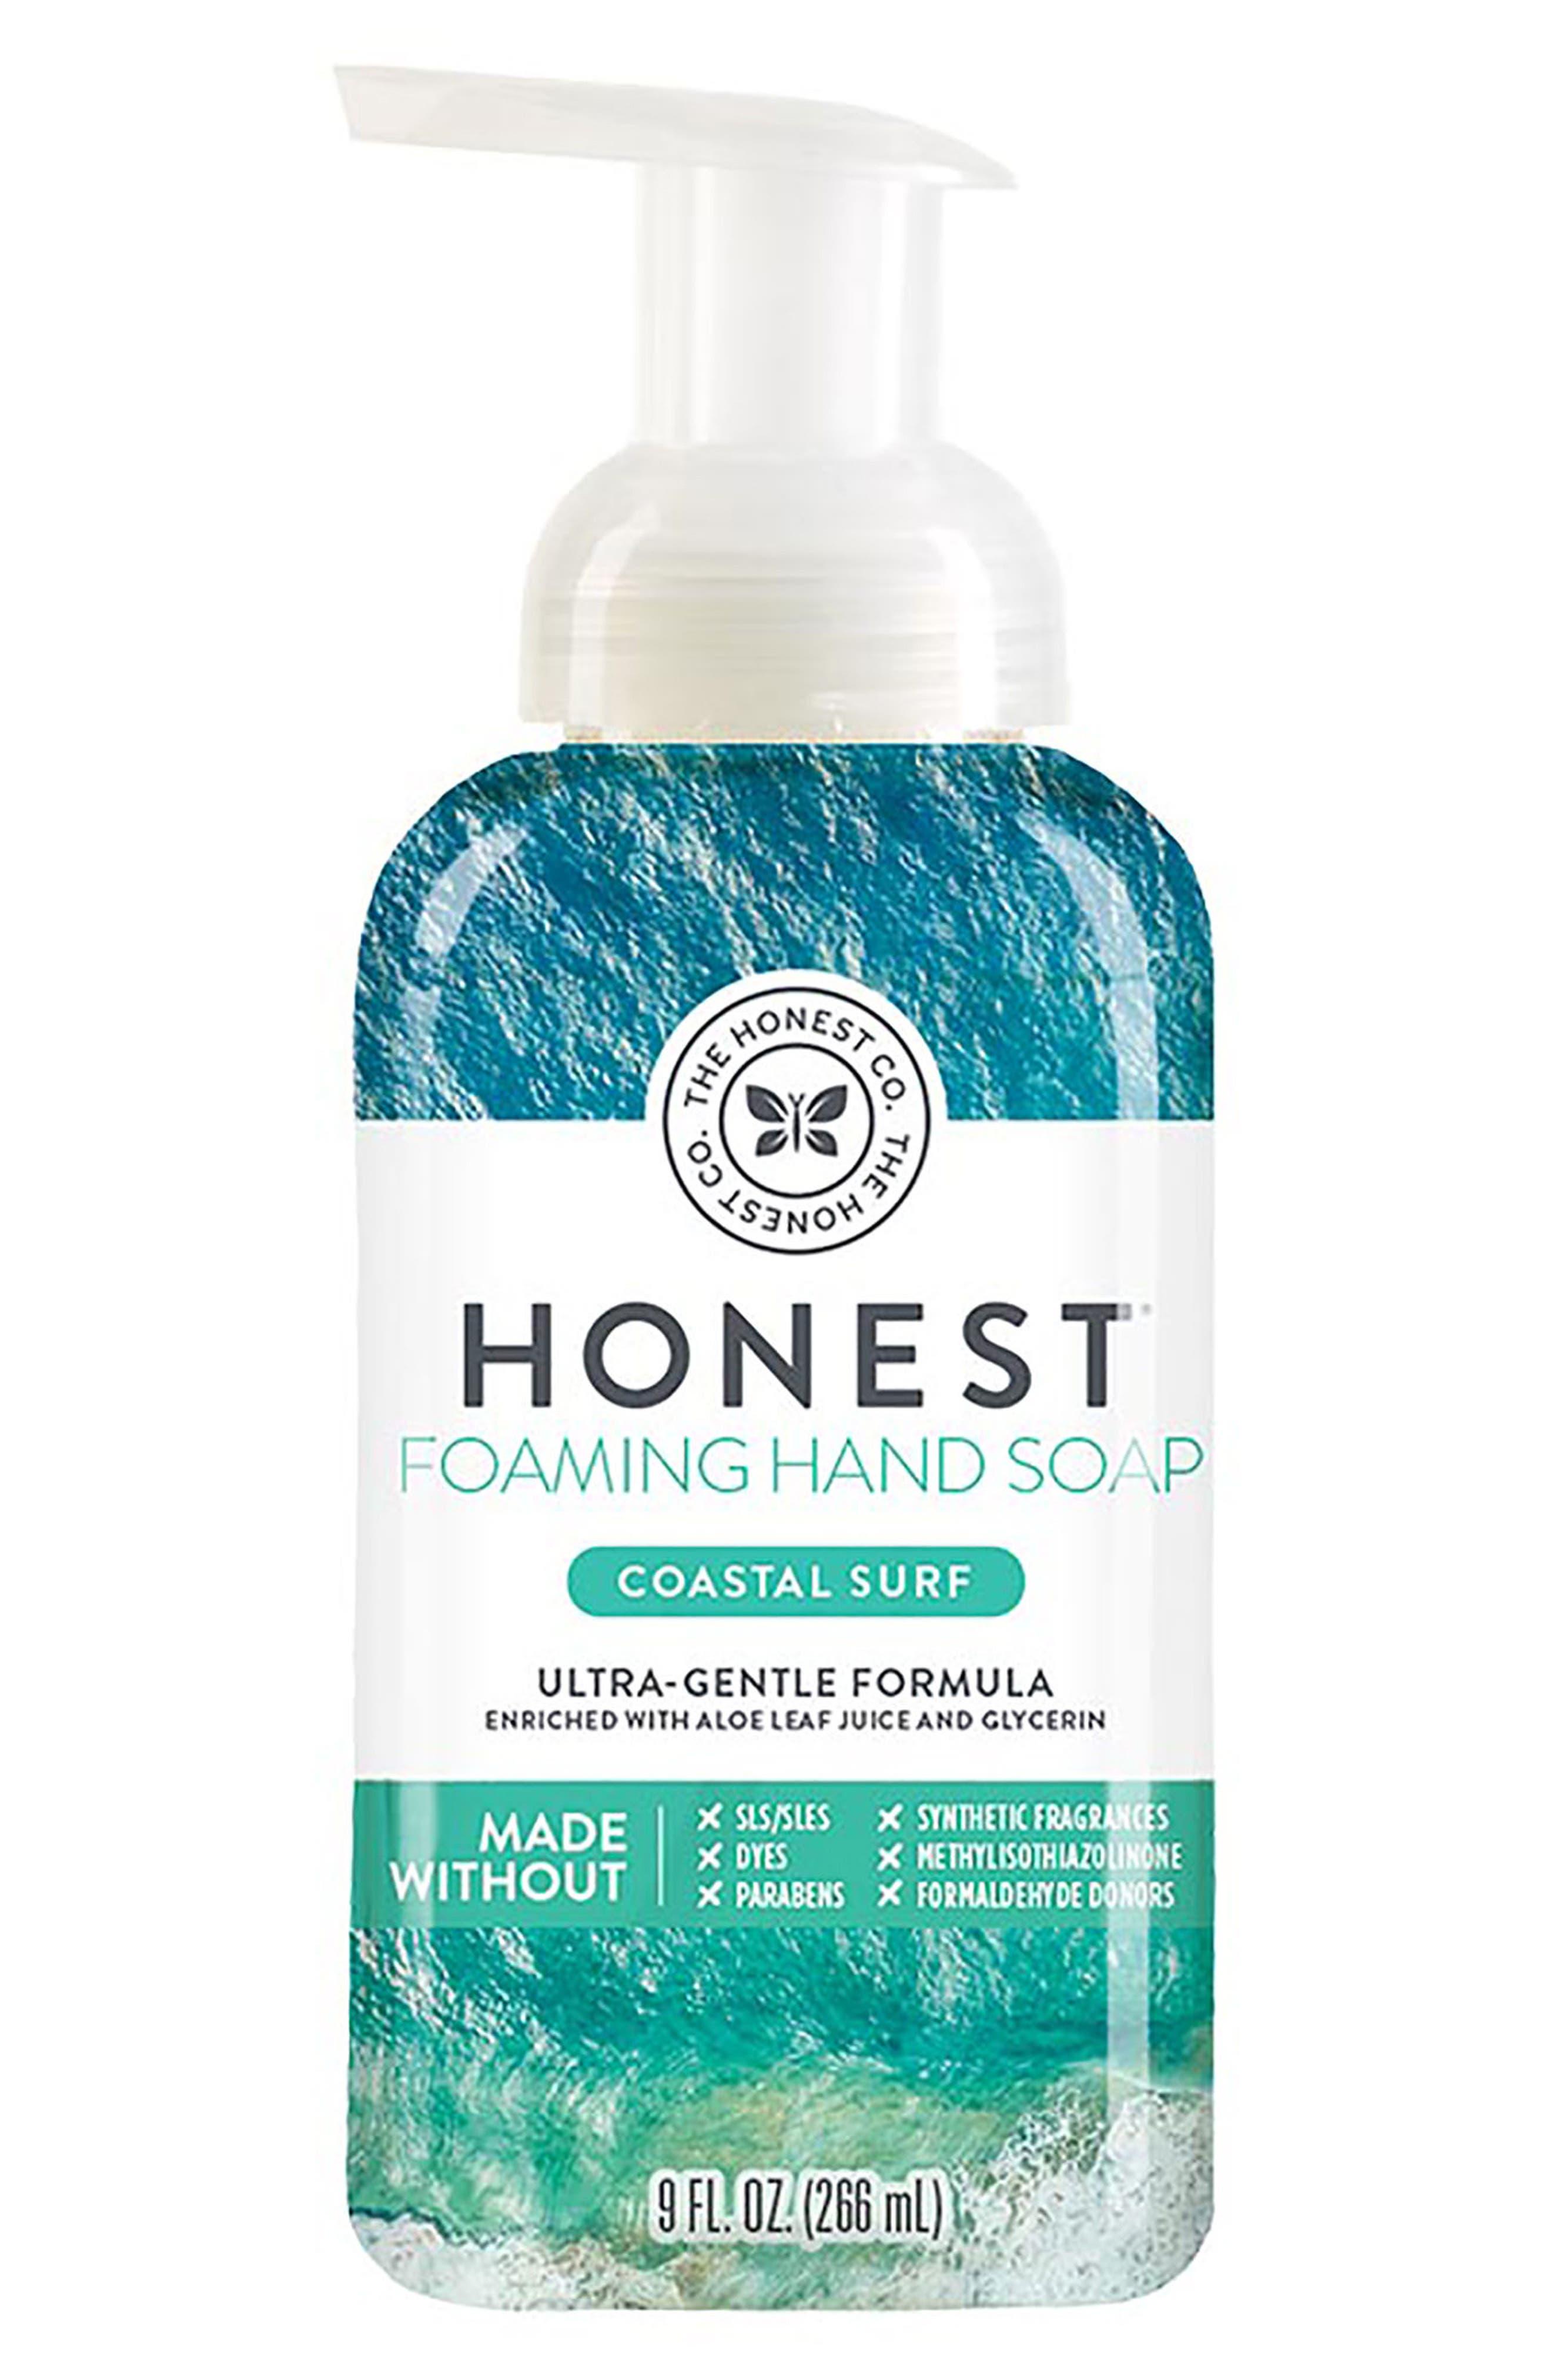 Coastal Surf Foaming Hand Soap,                             Main thumbnail 1, color,                             400